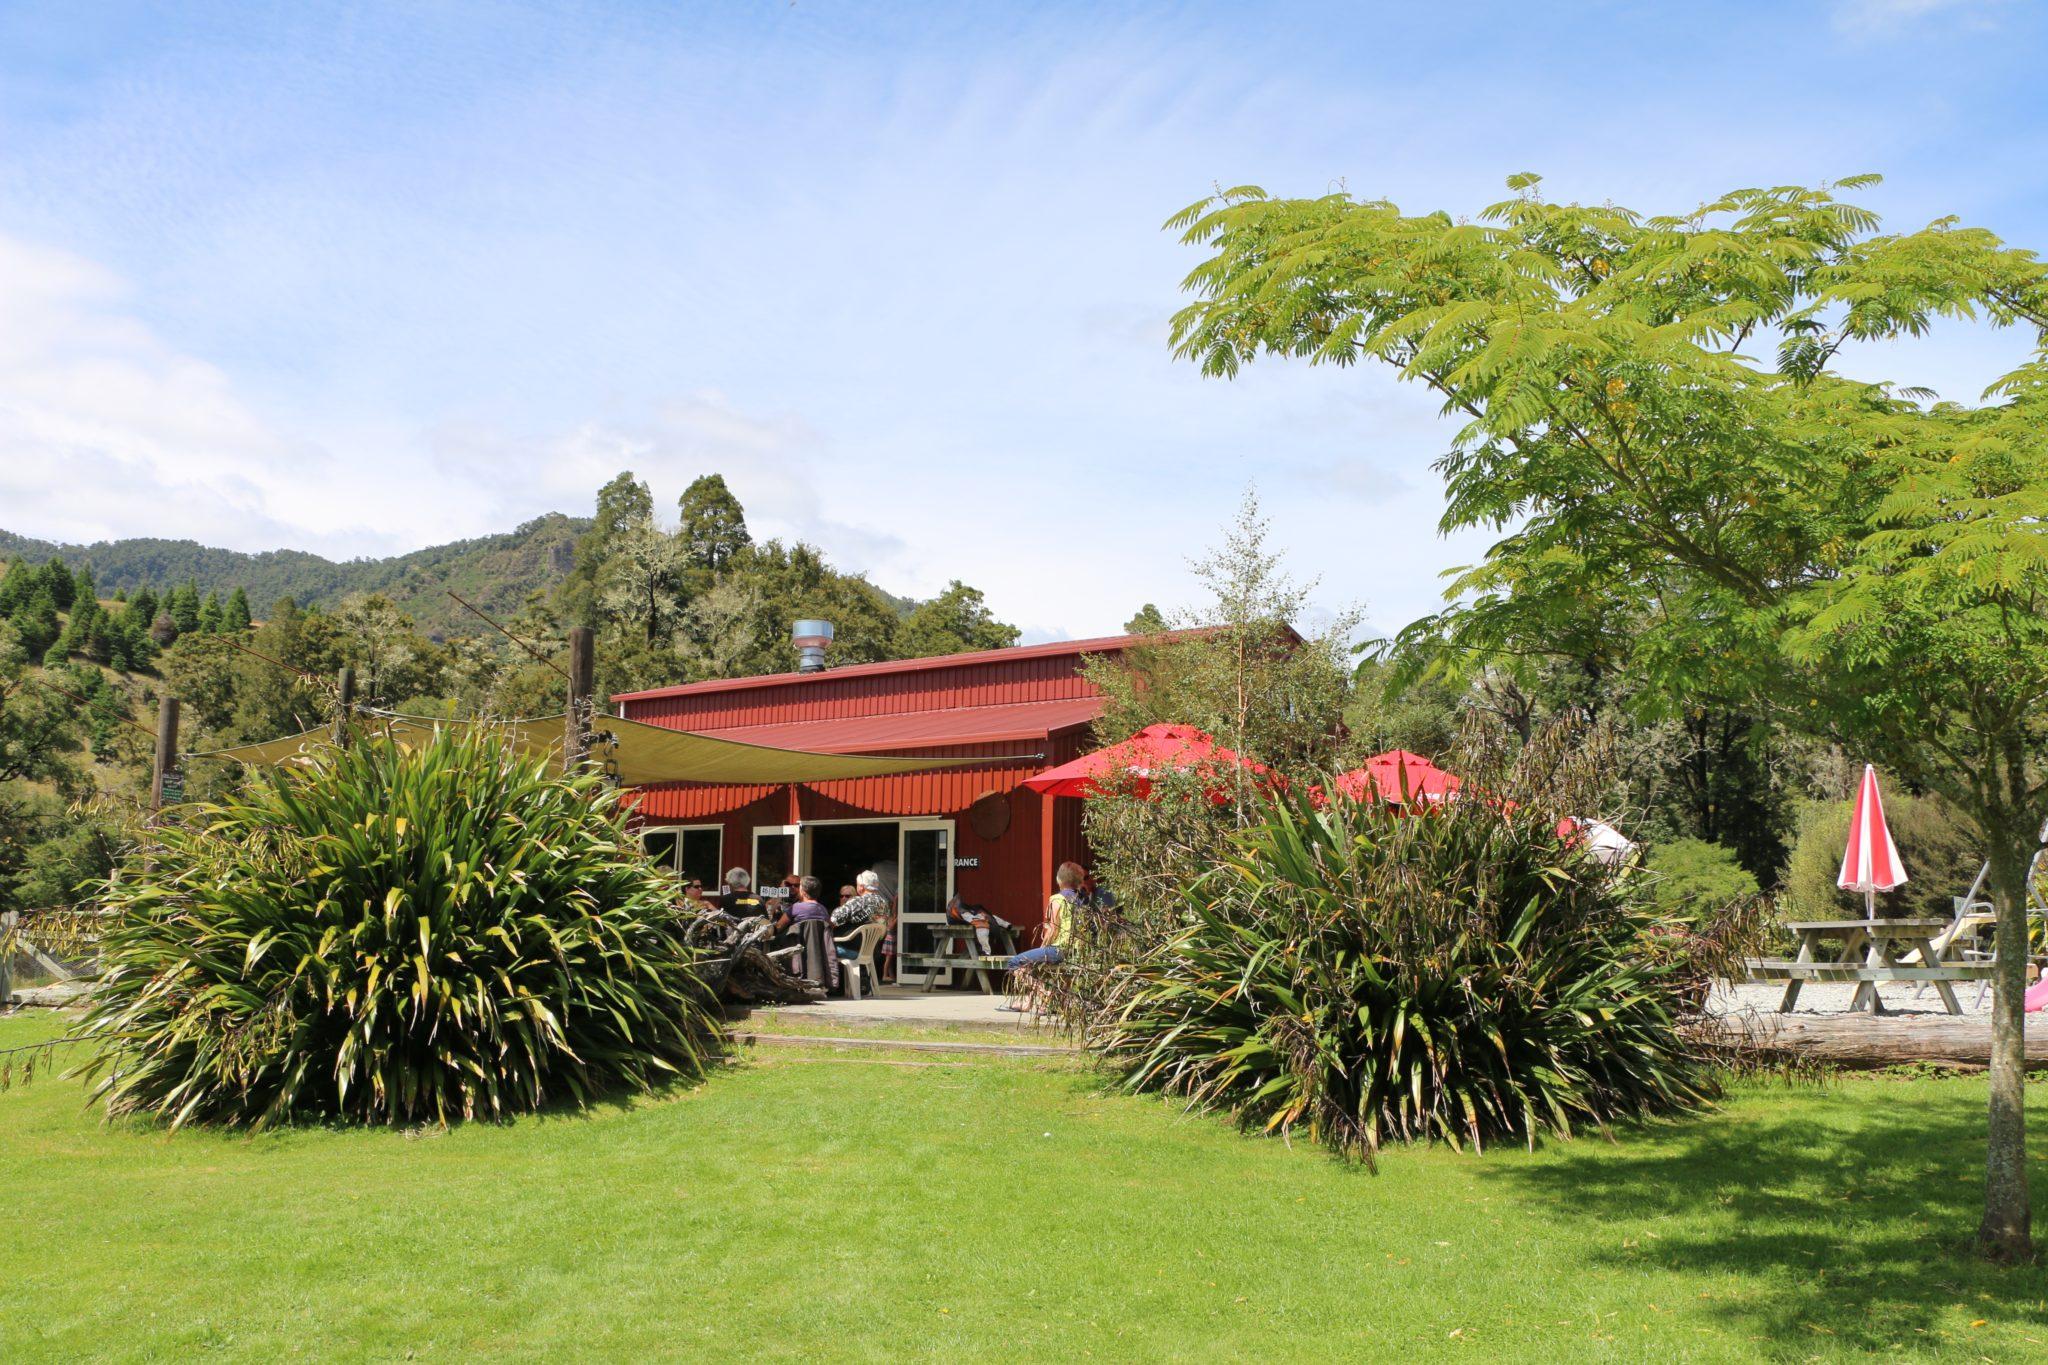 Red Barn Cafe & Animal Park